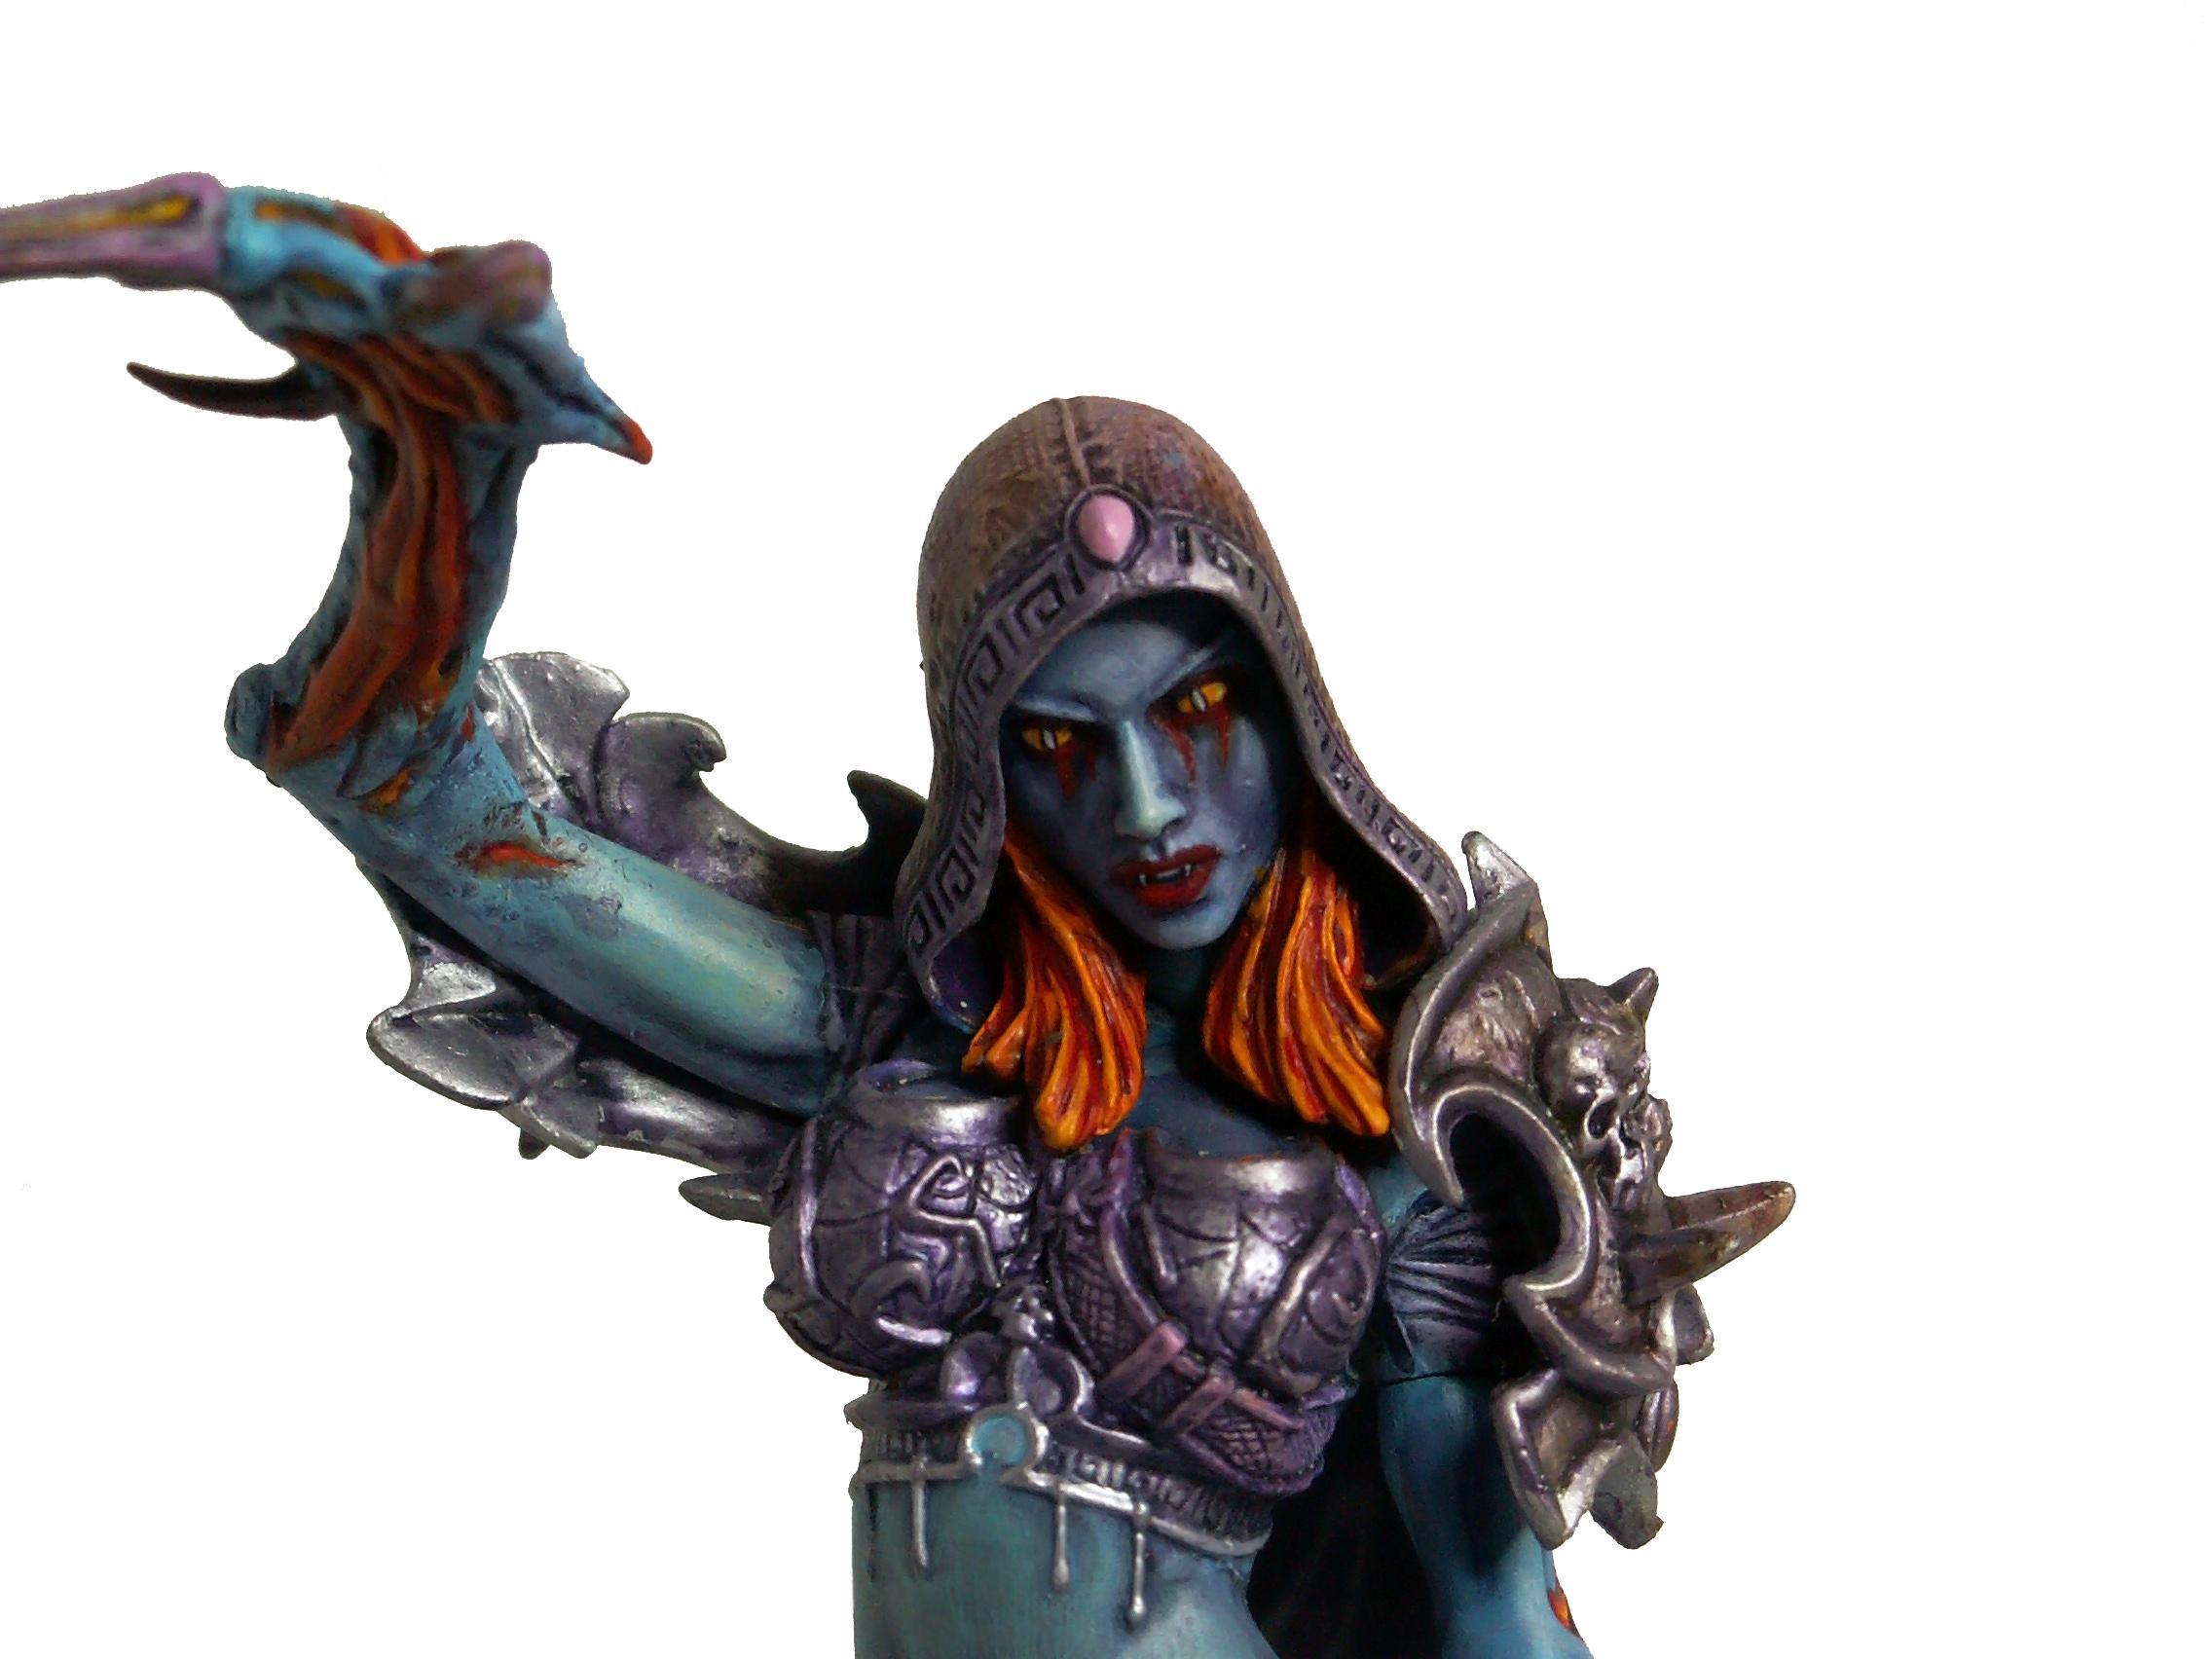 Chaos, Chaos Daemons, Conversion, Daemons, Defiler, Slanesh, Soul Grinder, Walker, Warhammer 40,000, Warhammer Fantasy